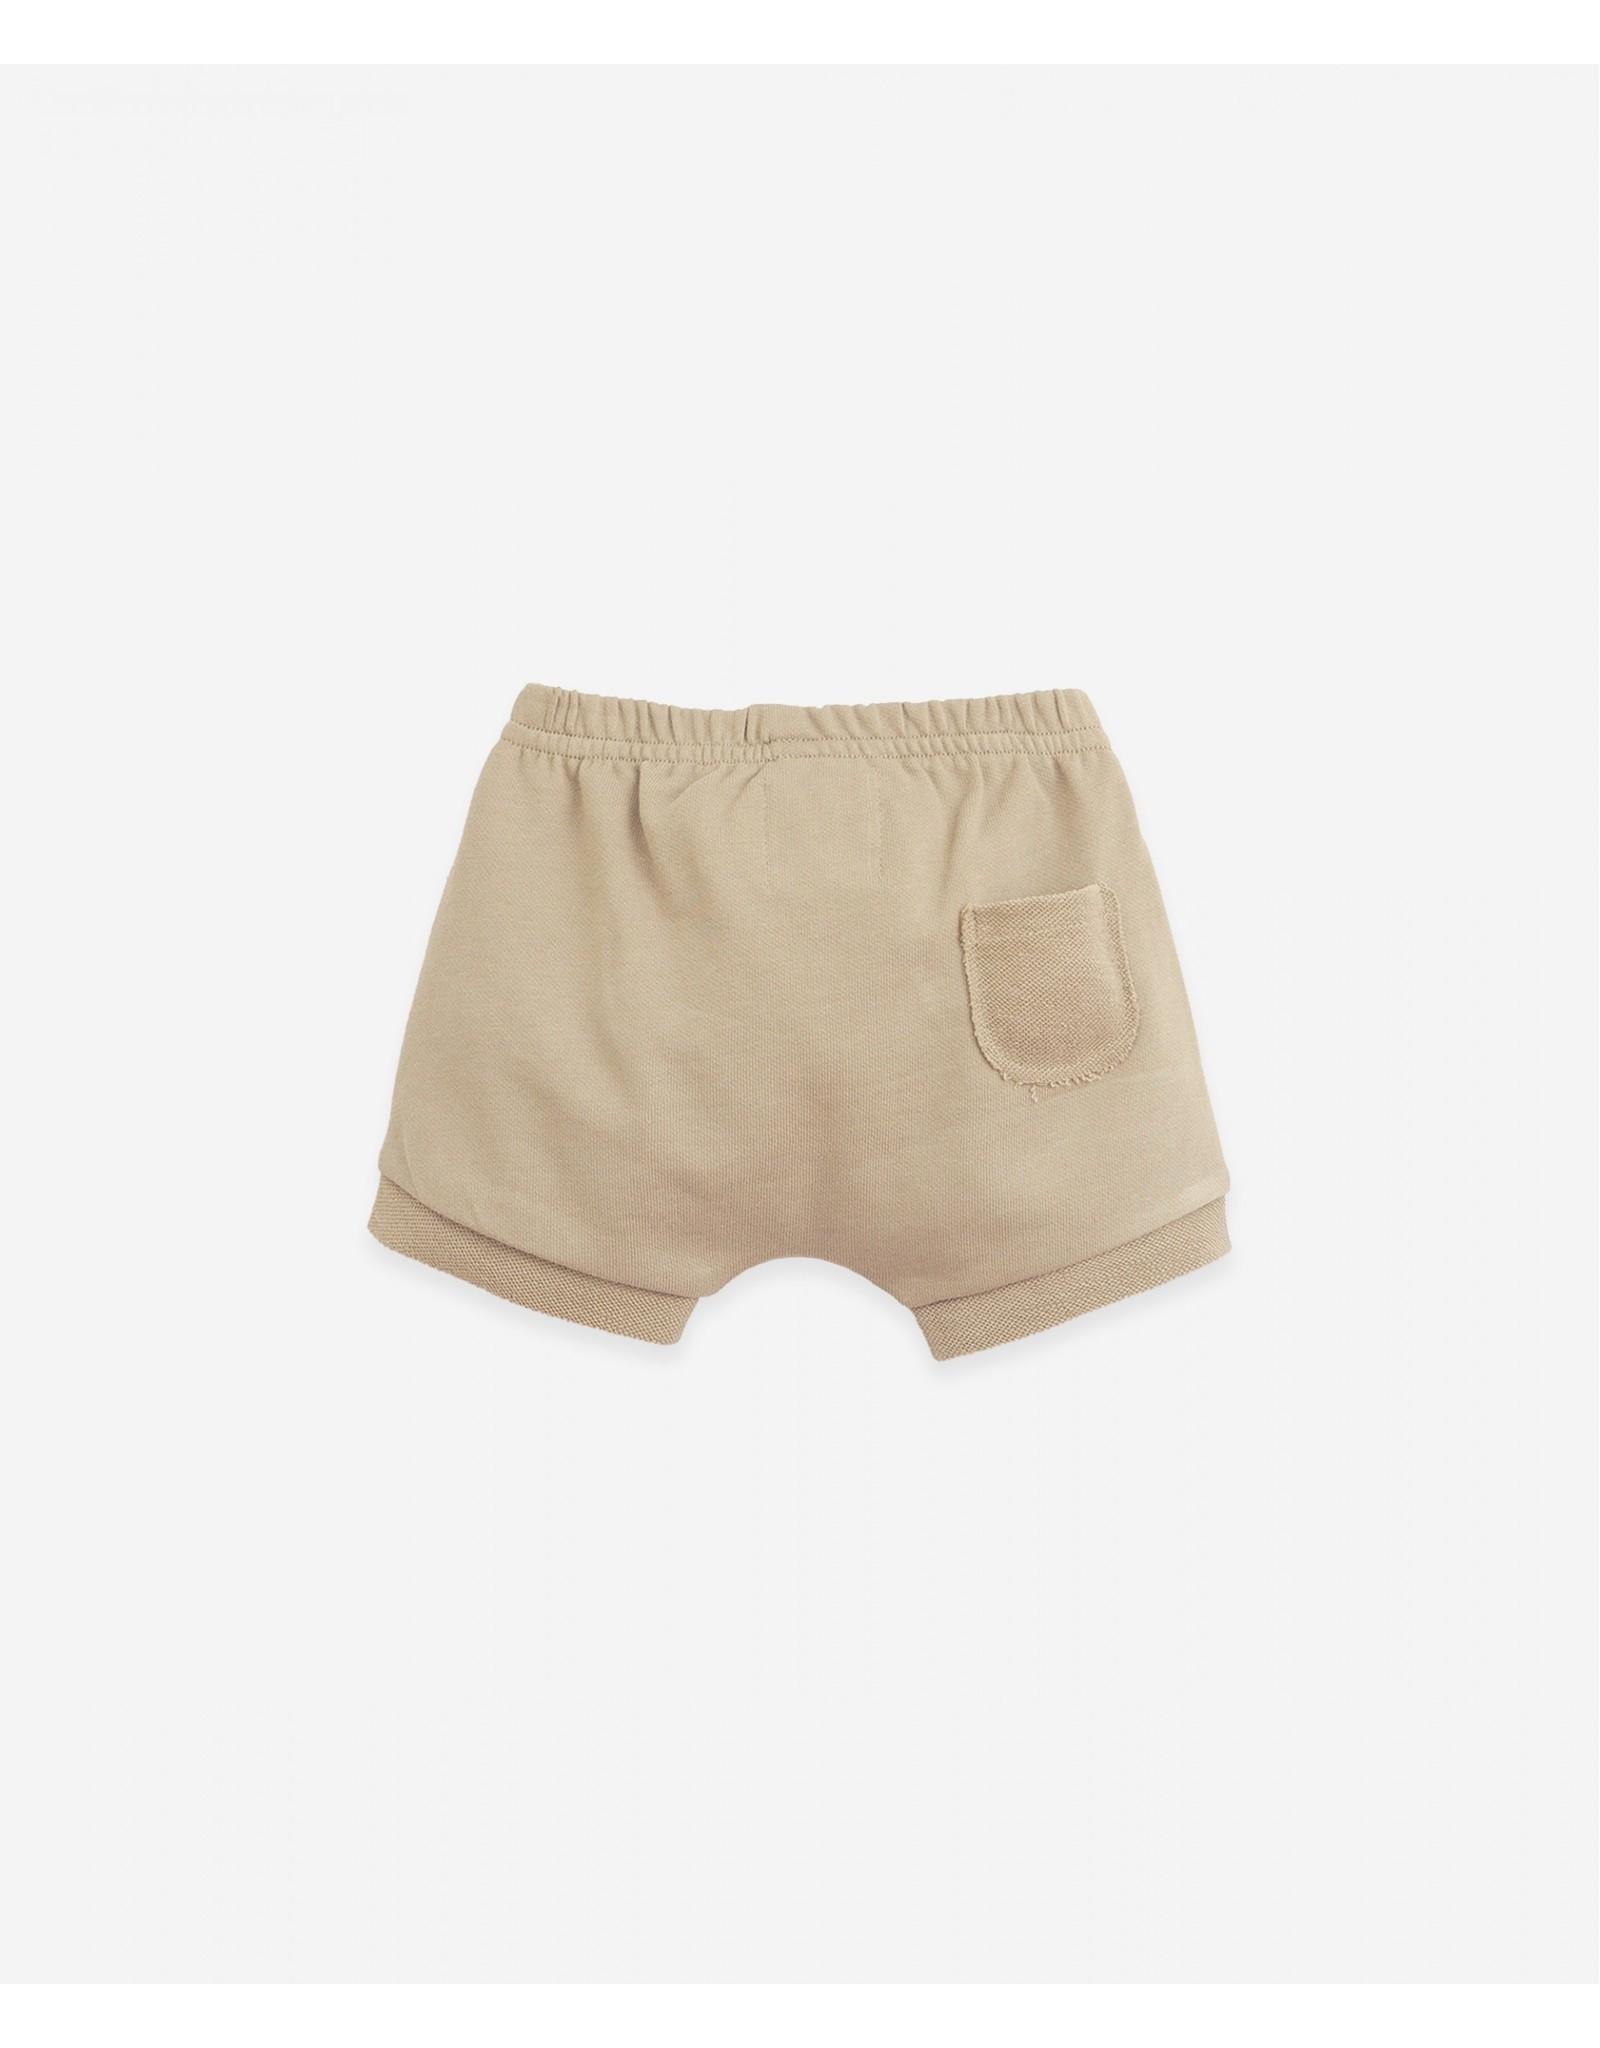 Play Up Play Up Jersey Stitch Organic Cotton Shorts Joao